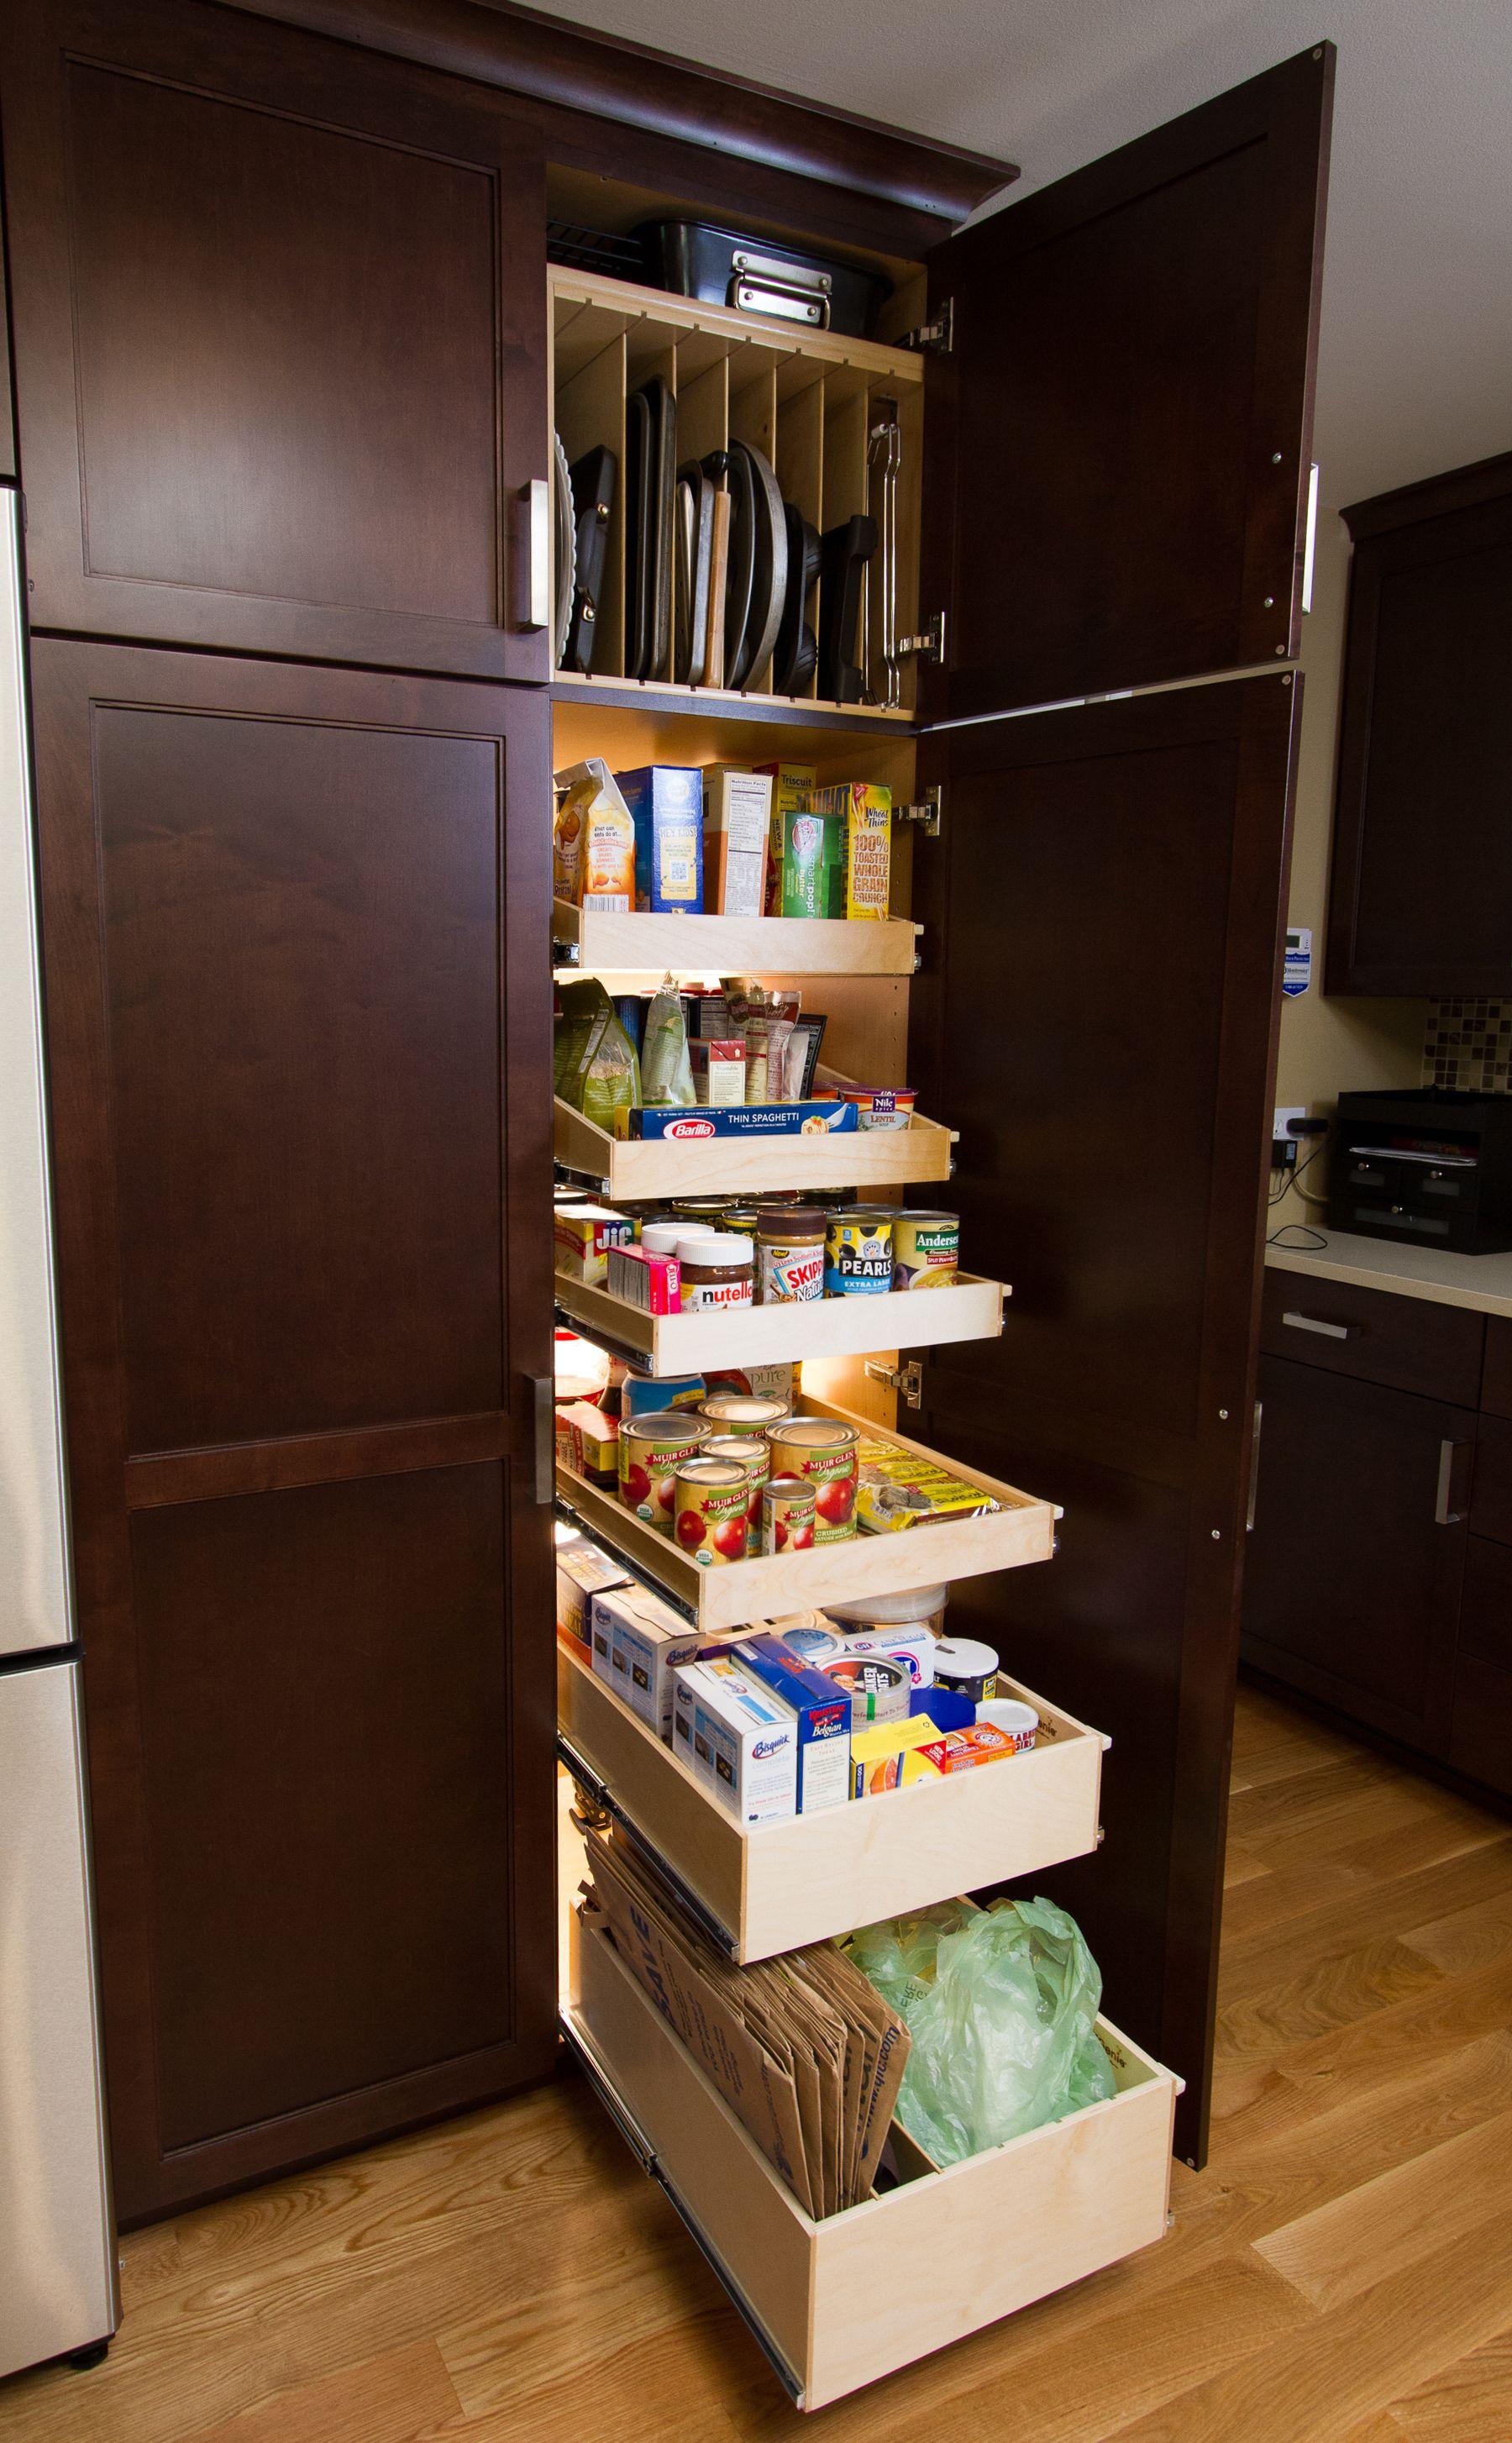 shelf genie slide out pantry shelves from ShelfGenie of